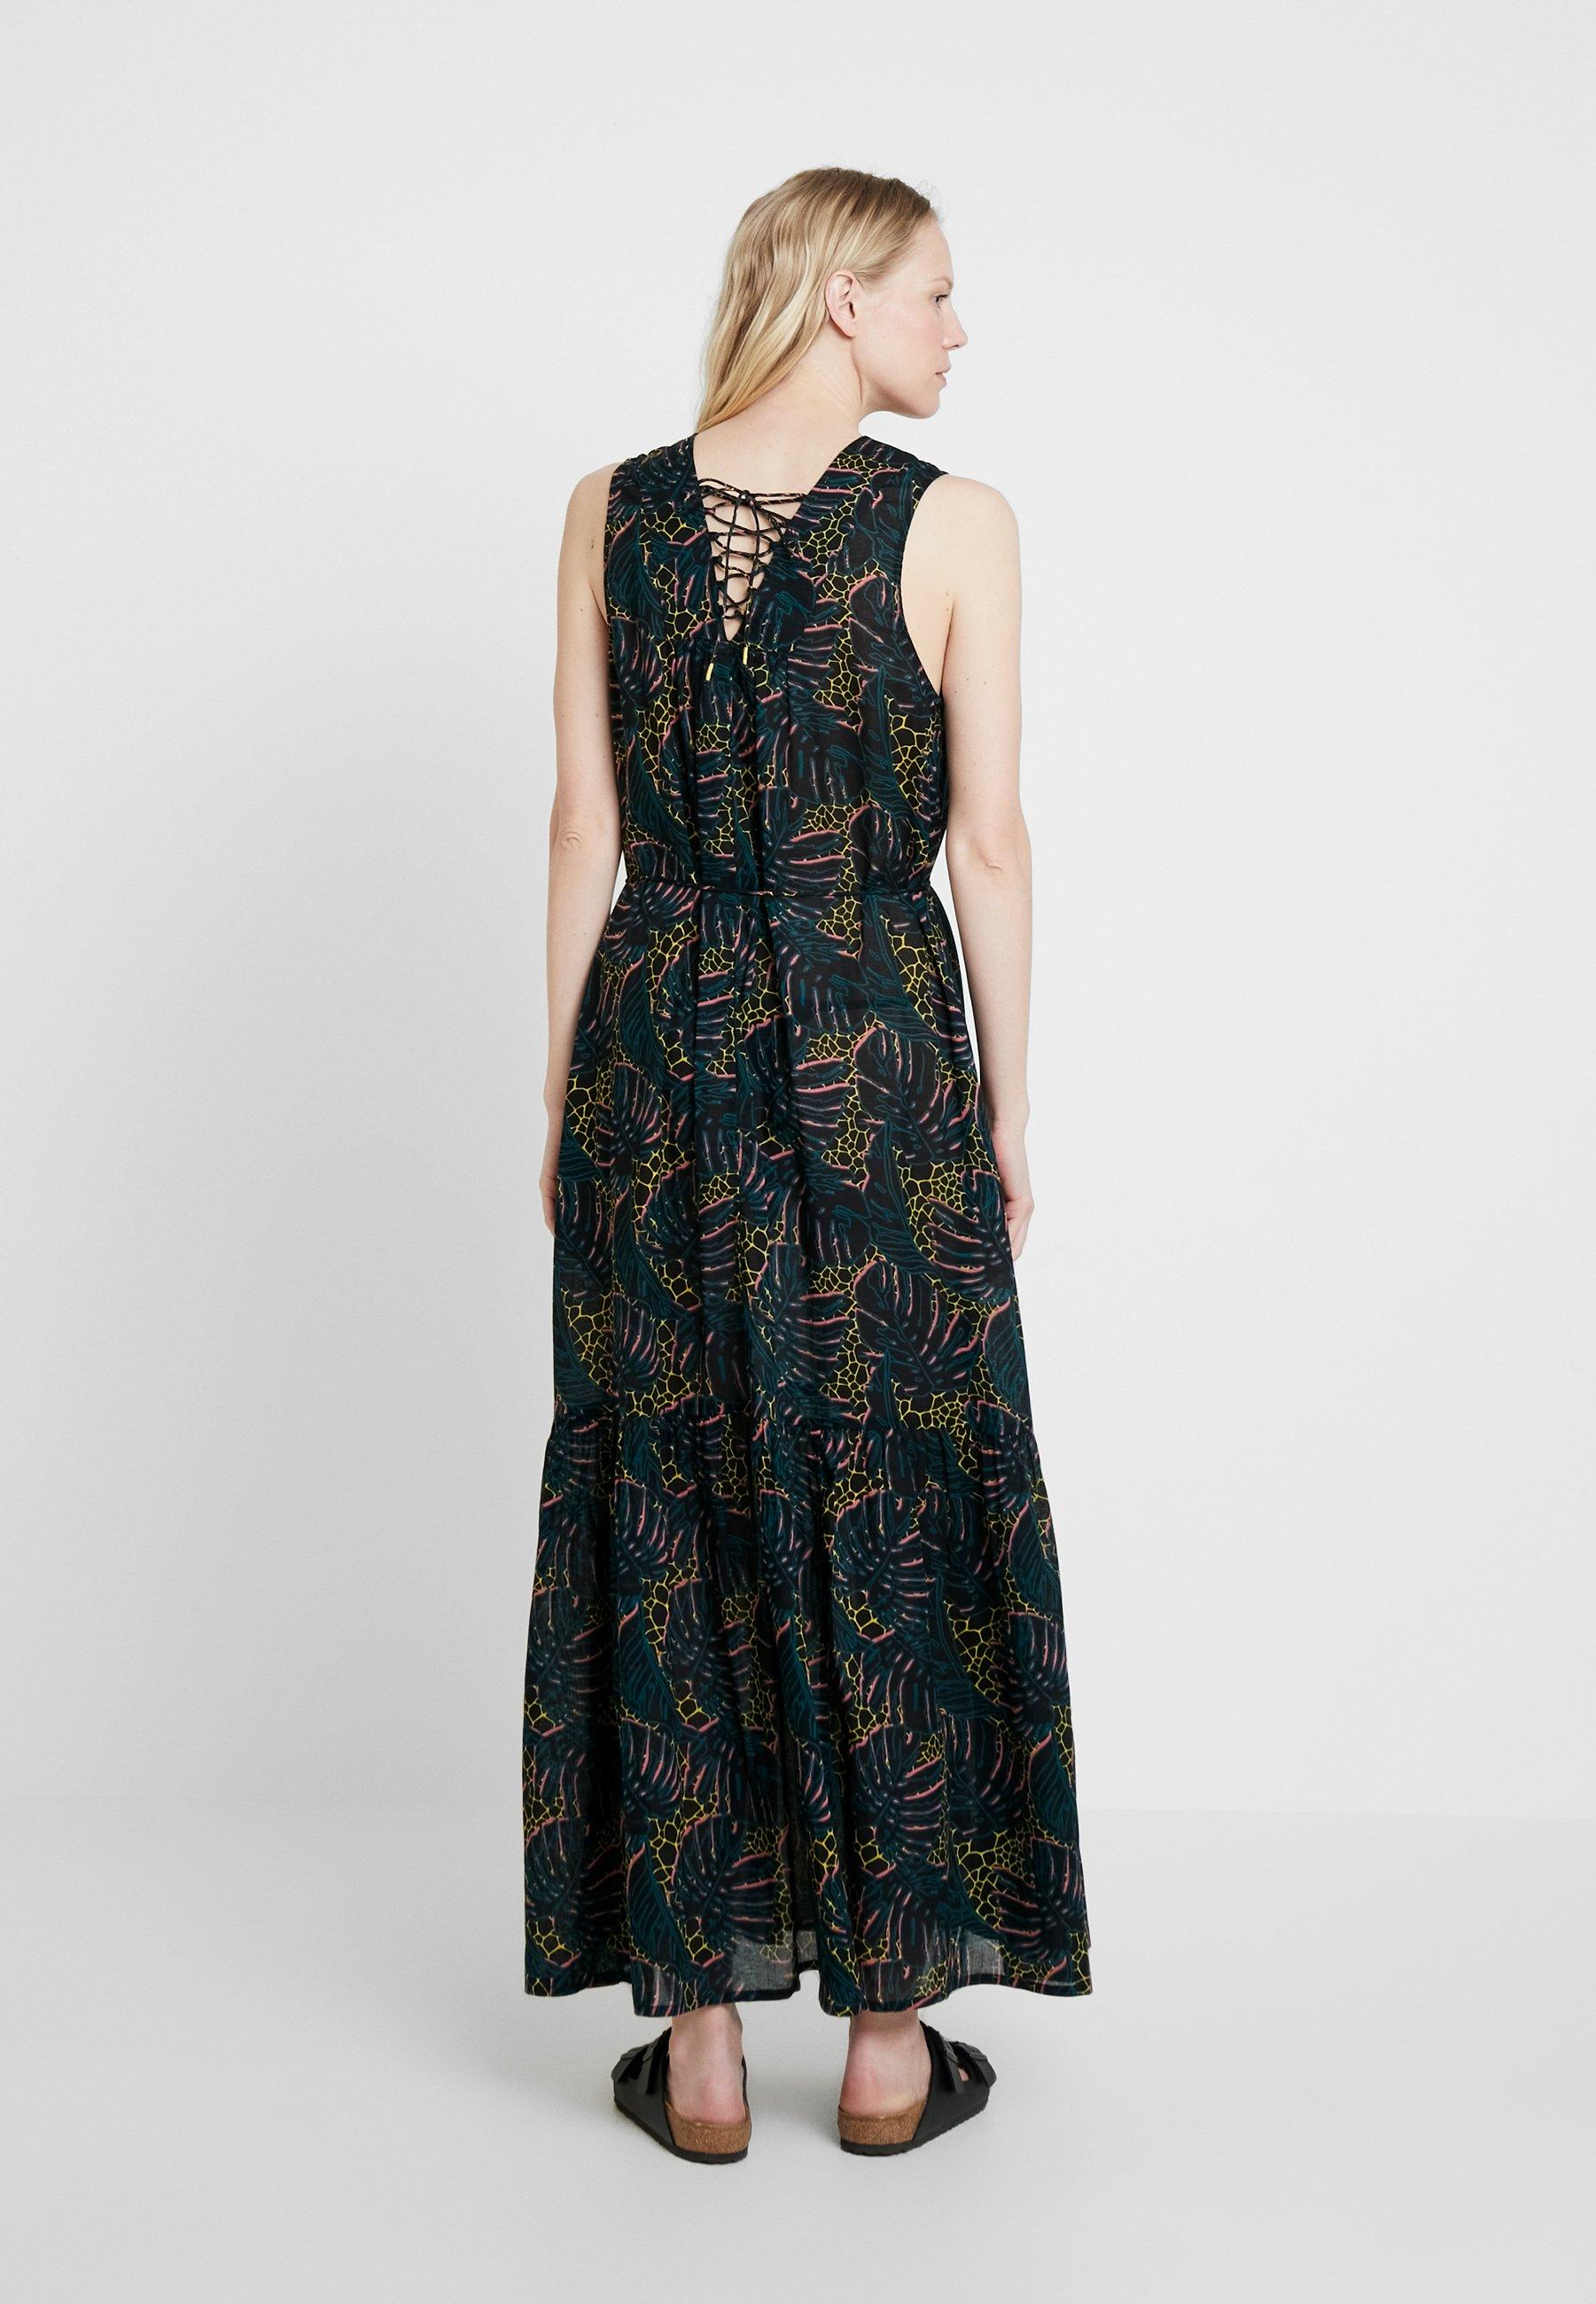 Designed s Robe LongueBlack Q By xdBoeCr